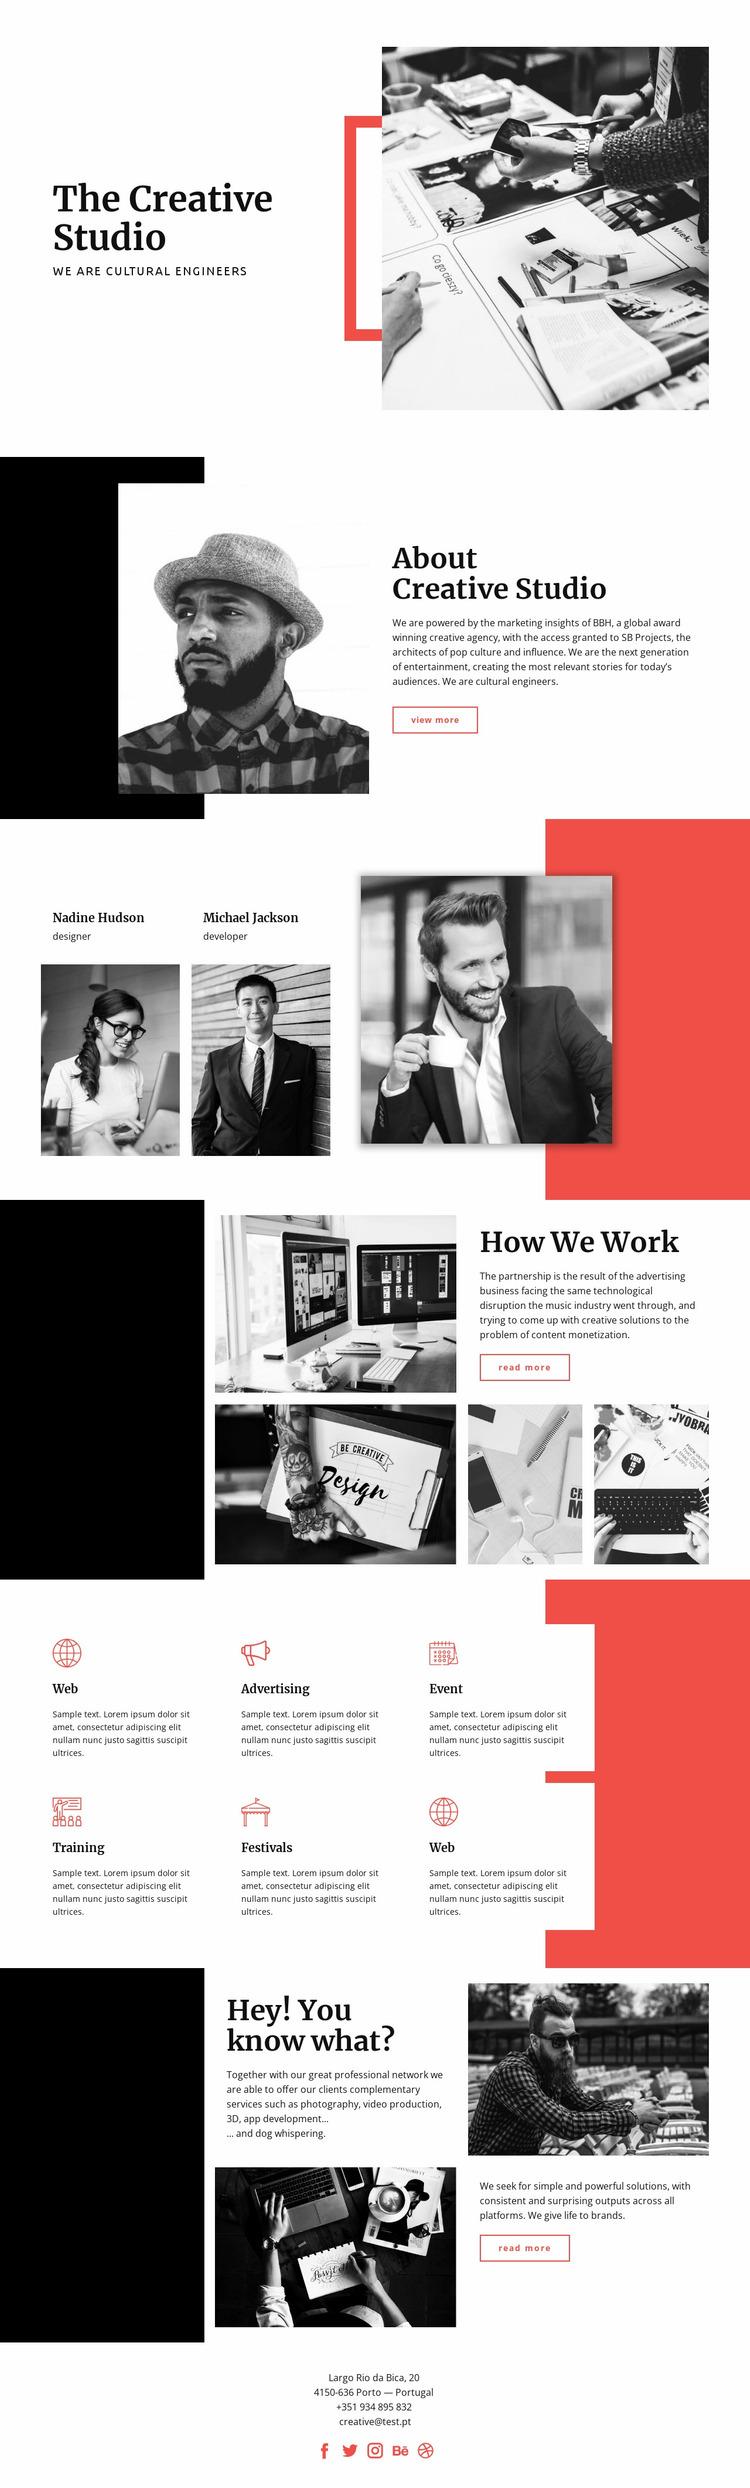 The Creative Studio Website Mockup